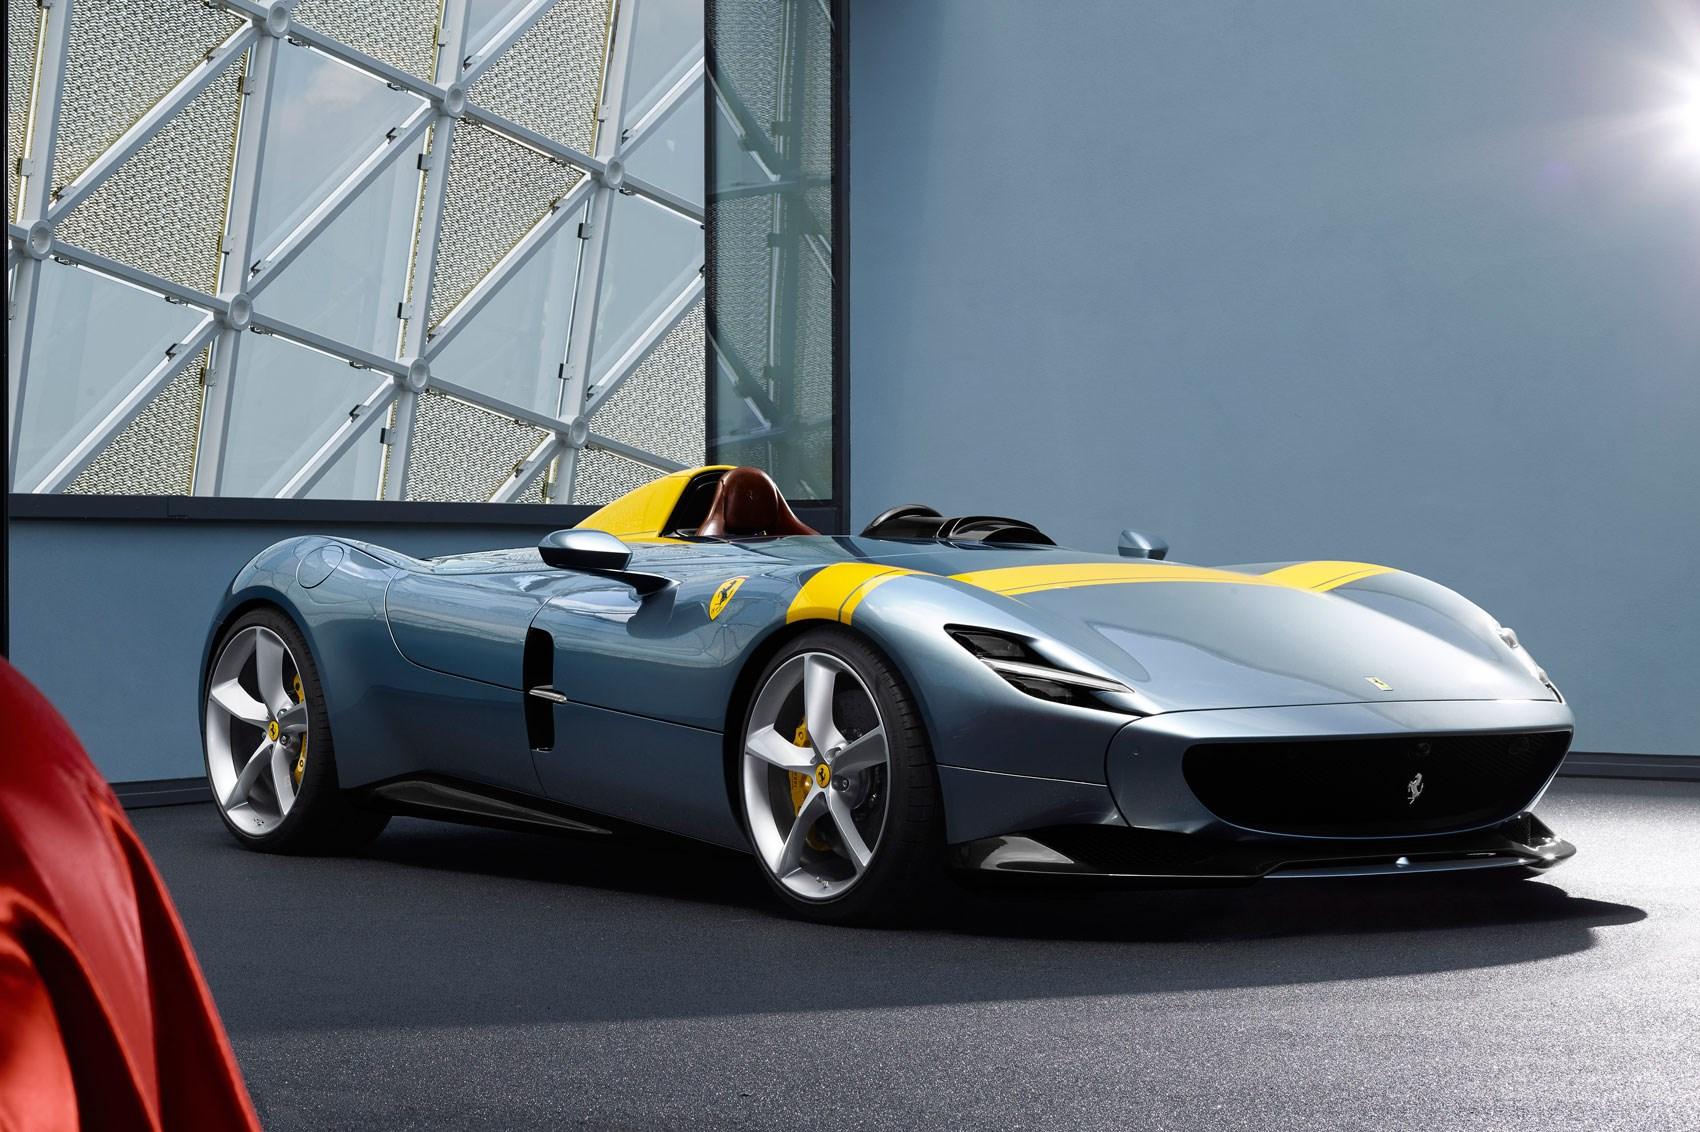 Ferrari Monza SP1 and SP2: pricing confirmed at Paris | CAR Magazine